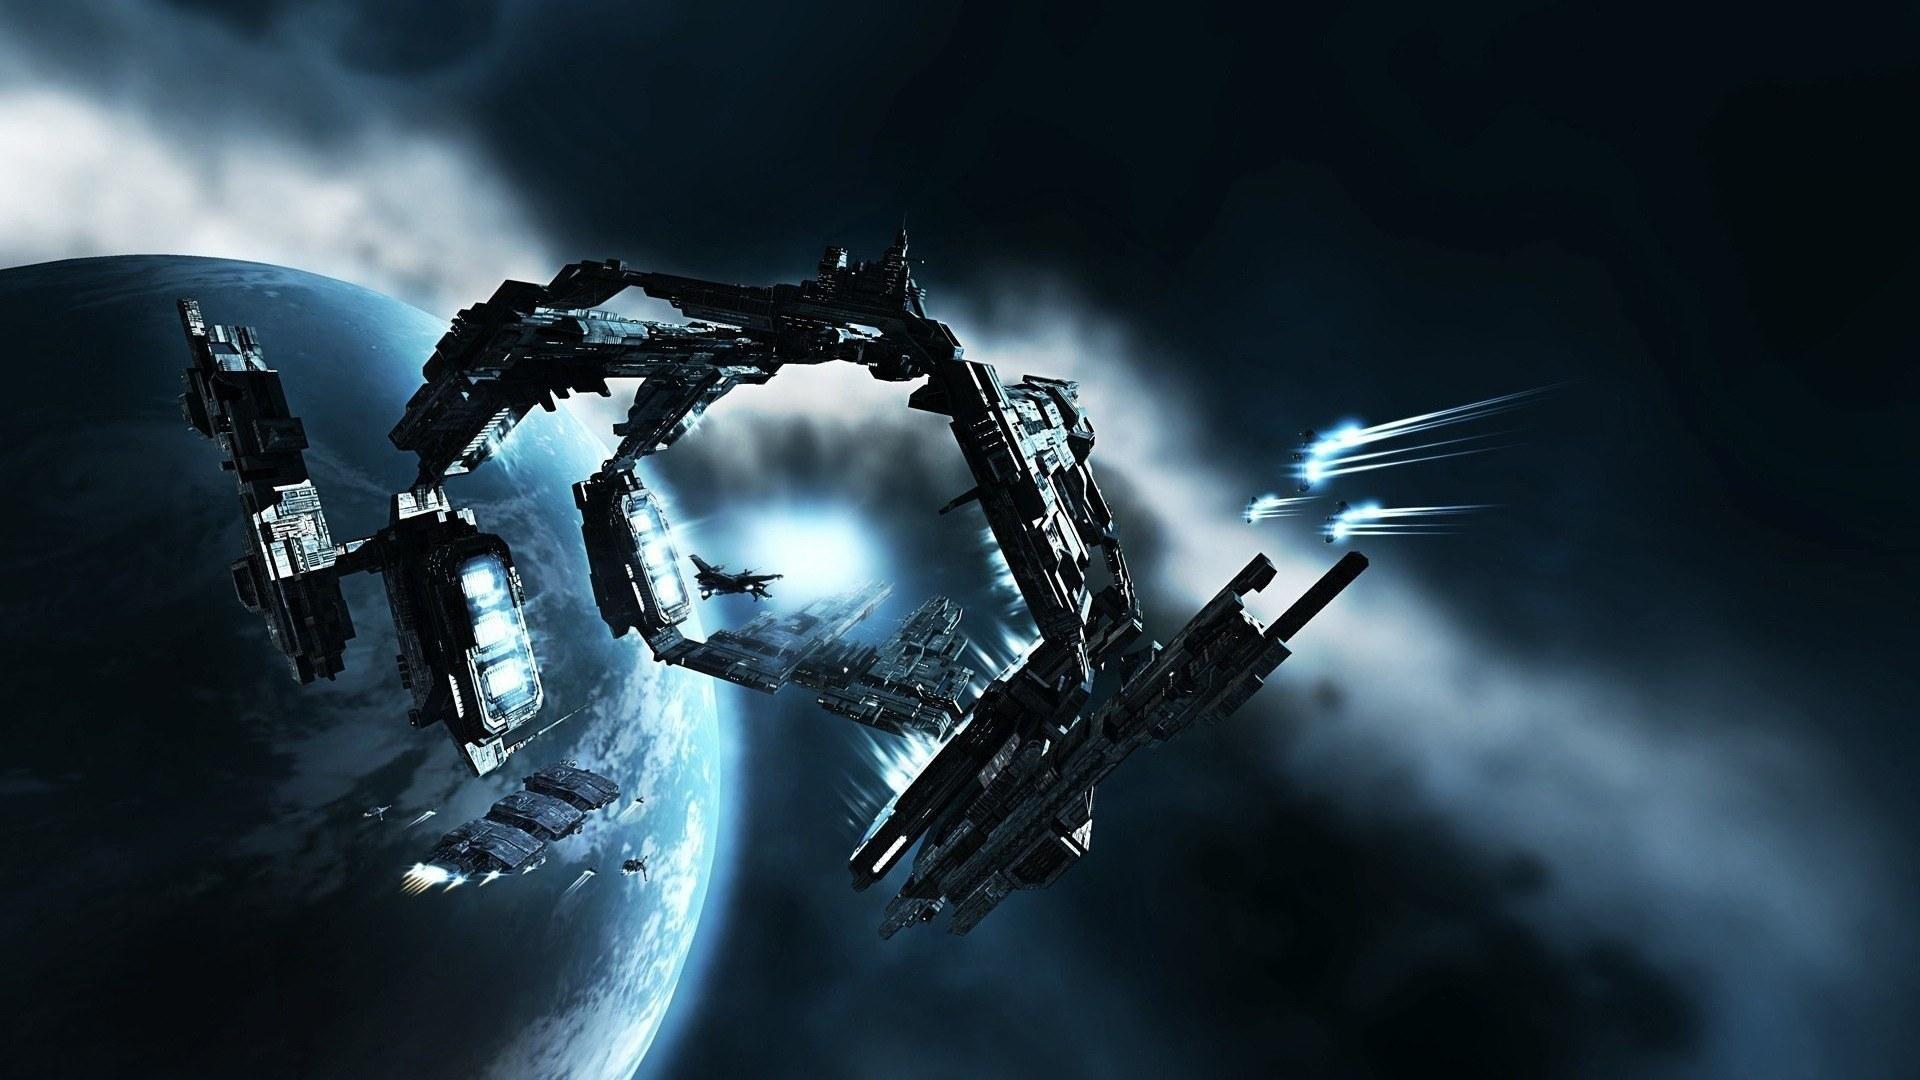 General 1920x1080 science fiction EVE Online gates space spaceship Caldari